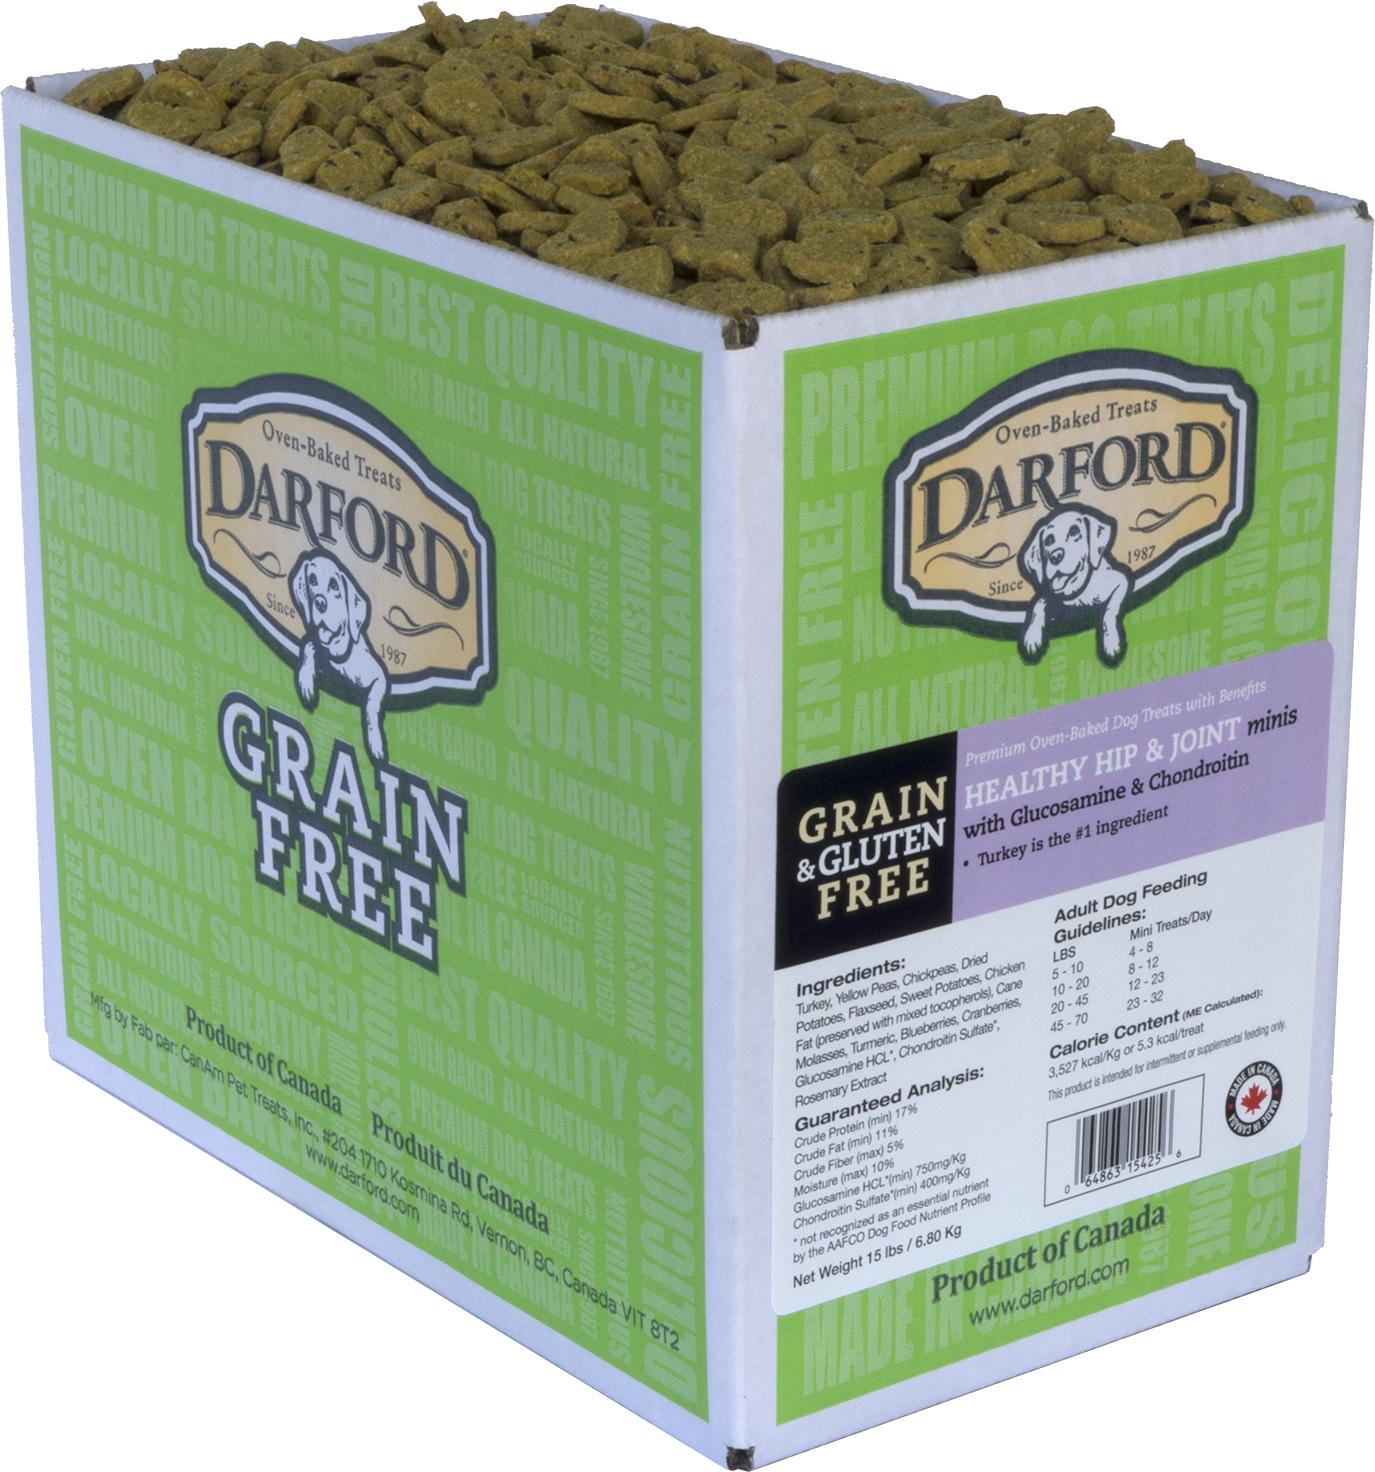 Darford Healthy Hip & Joint Grain-Free Mini Dog Treats, 15-lb box